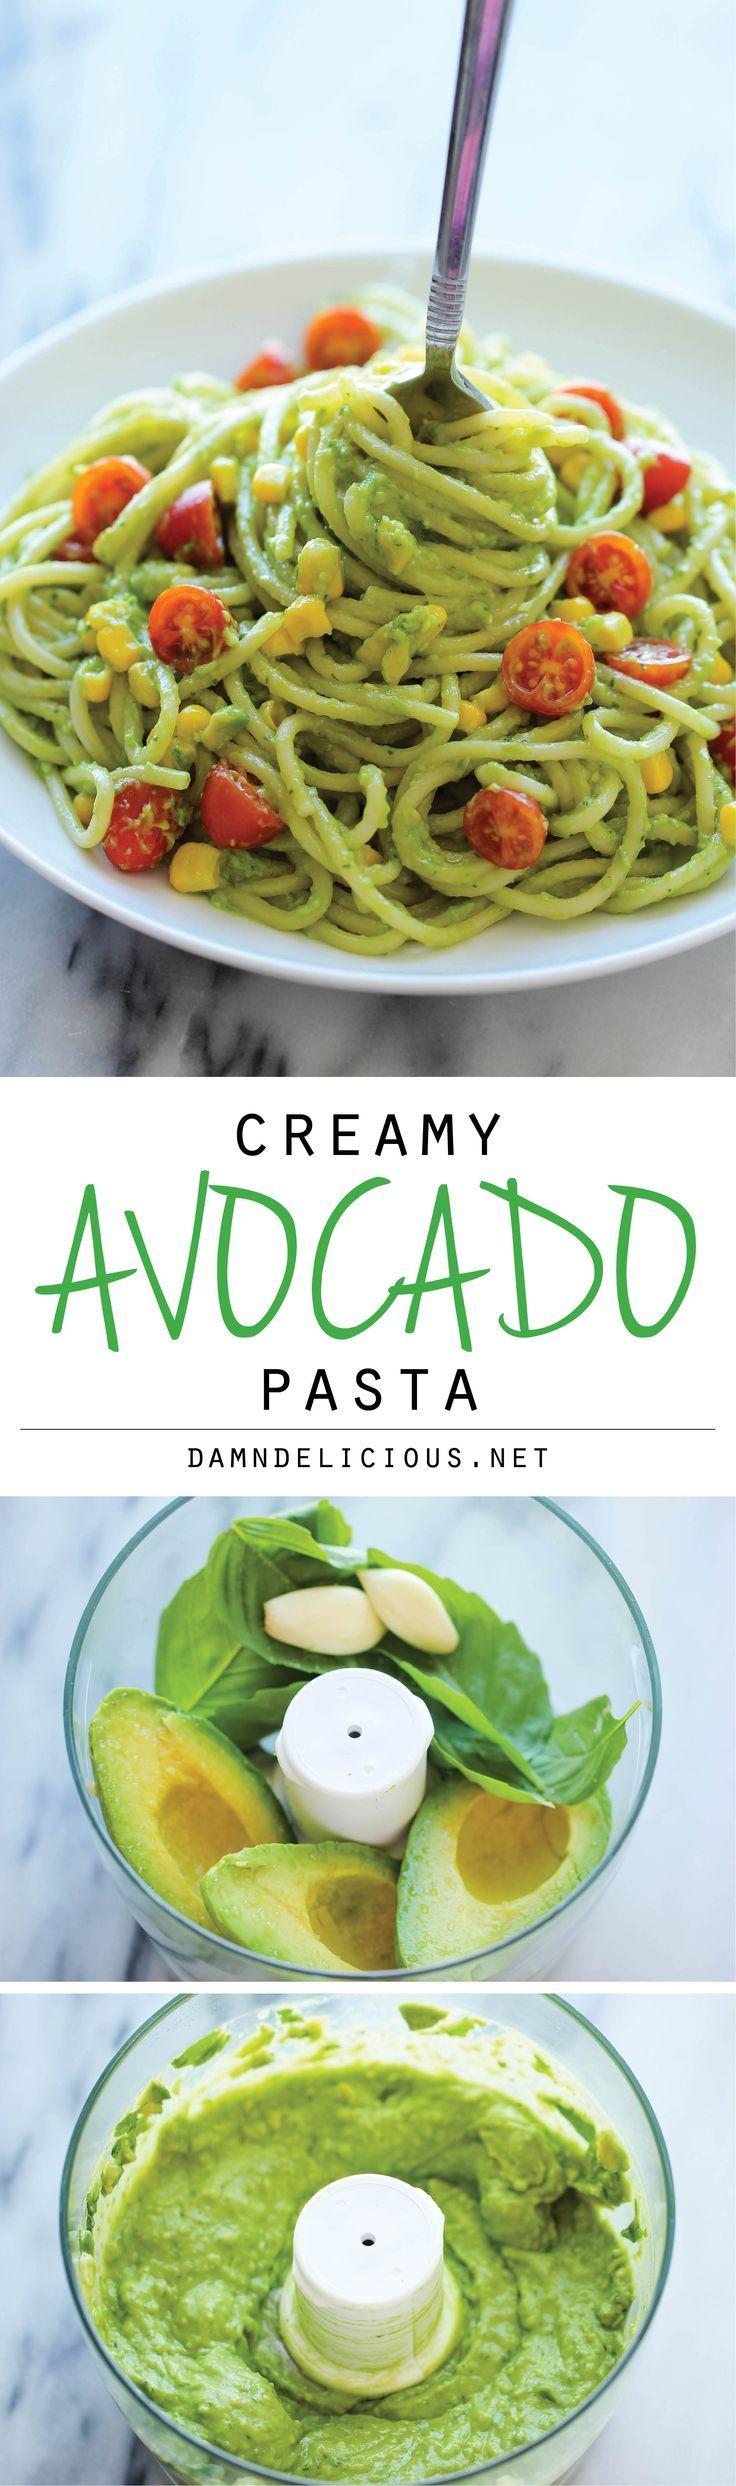 Clean Eating Avocado Pasta Recipe